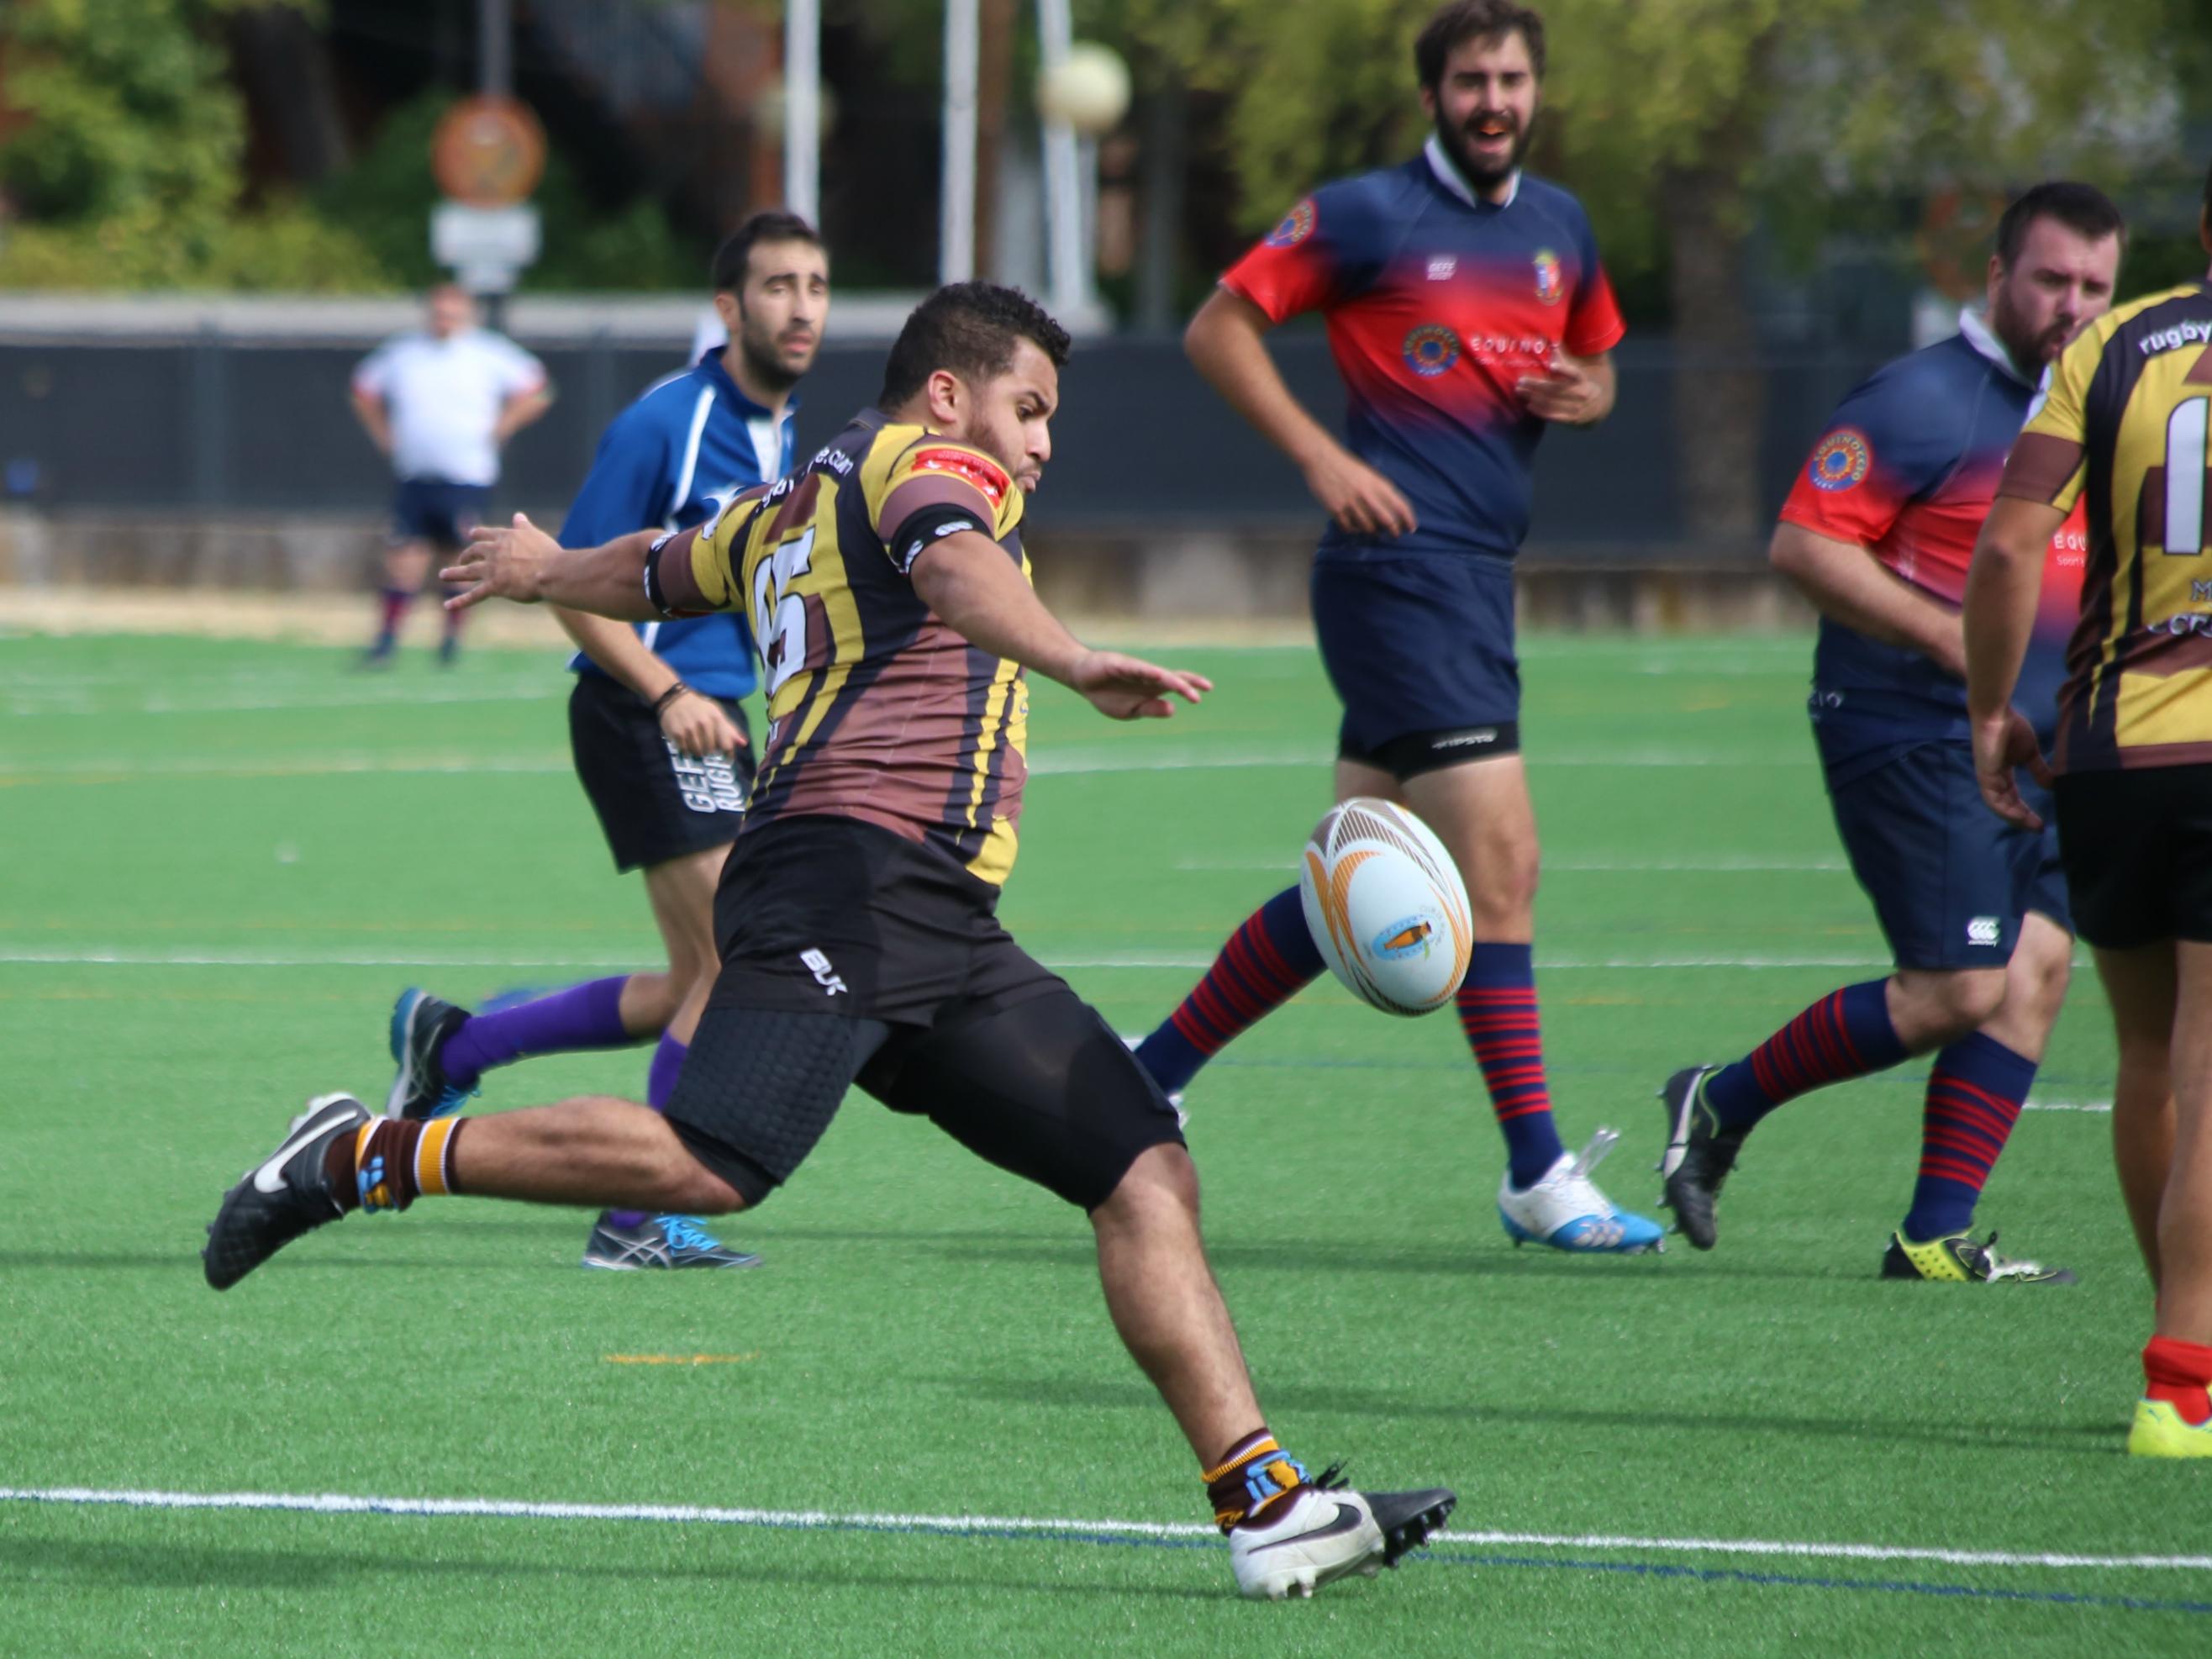 Liga Autonómica de Rugby 2018-2019, 1ª Regional, Jornada 15, Getafe Club de Rugby - Liceo Francés B